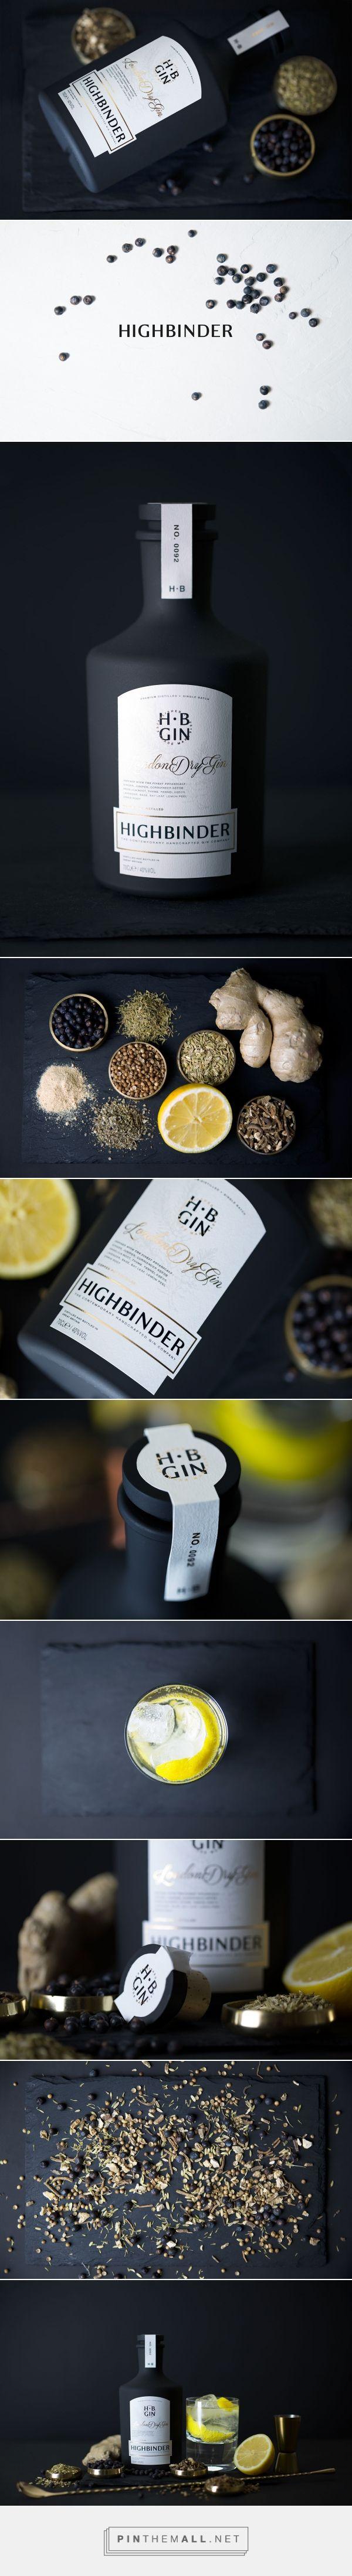 HIGHBINDER Dry Gin Packaging by Shane Goldberg | Fivestar Branding Agency – Design and Branding Agency & Curated Inspiration Gallery #packaging #packagingdesign #packagedesign #design #designinspiration